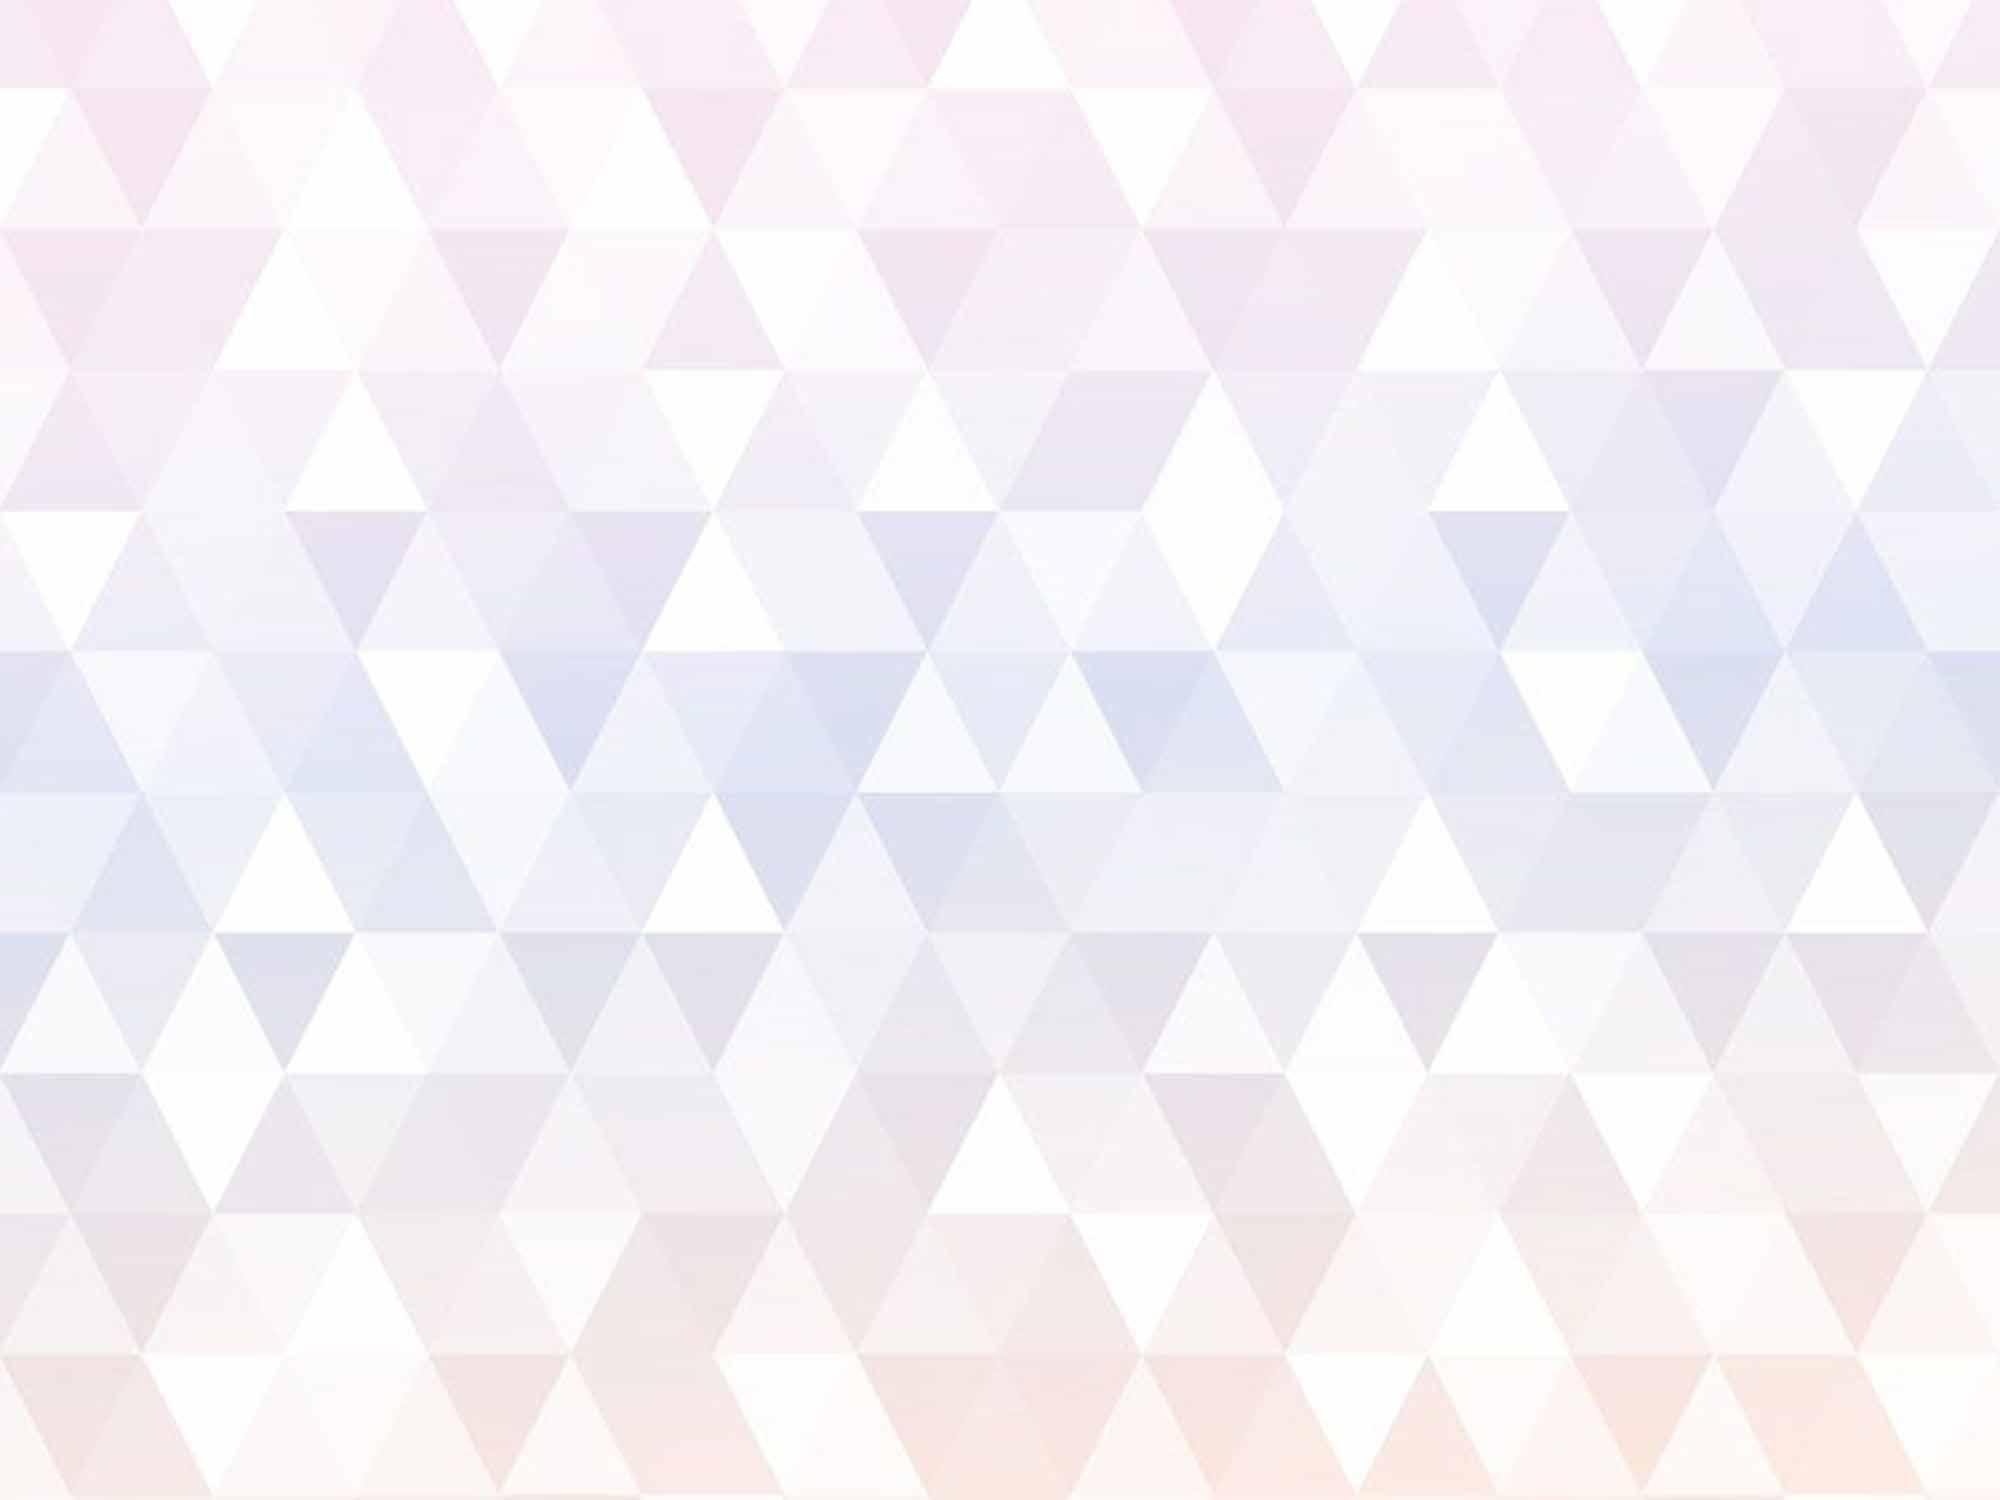 Papel de Parede para Sala Geométrico 0001 - Adesivos de Parede  - Paredes Decoradas